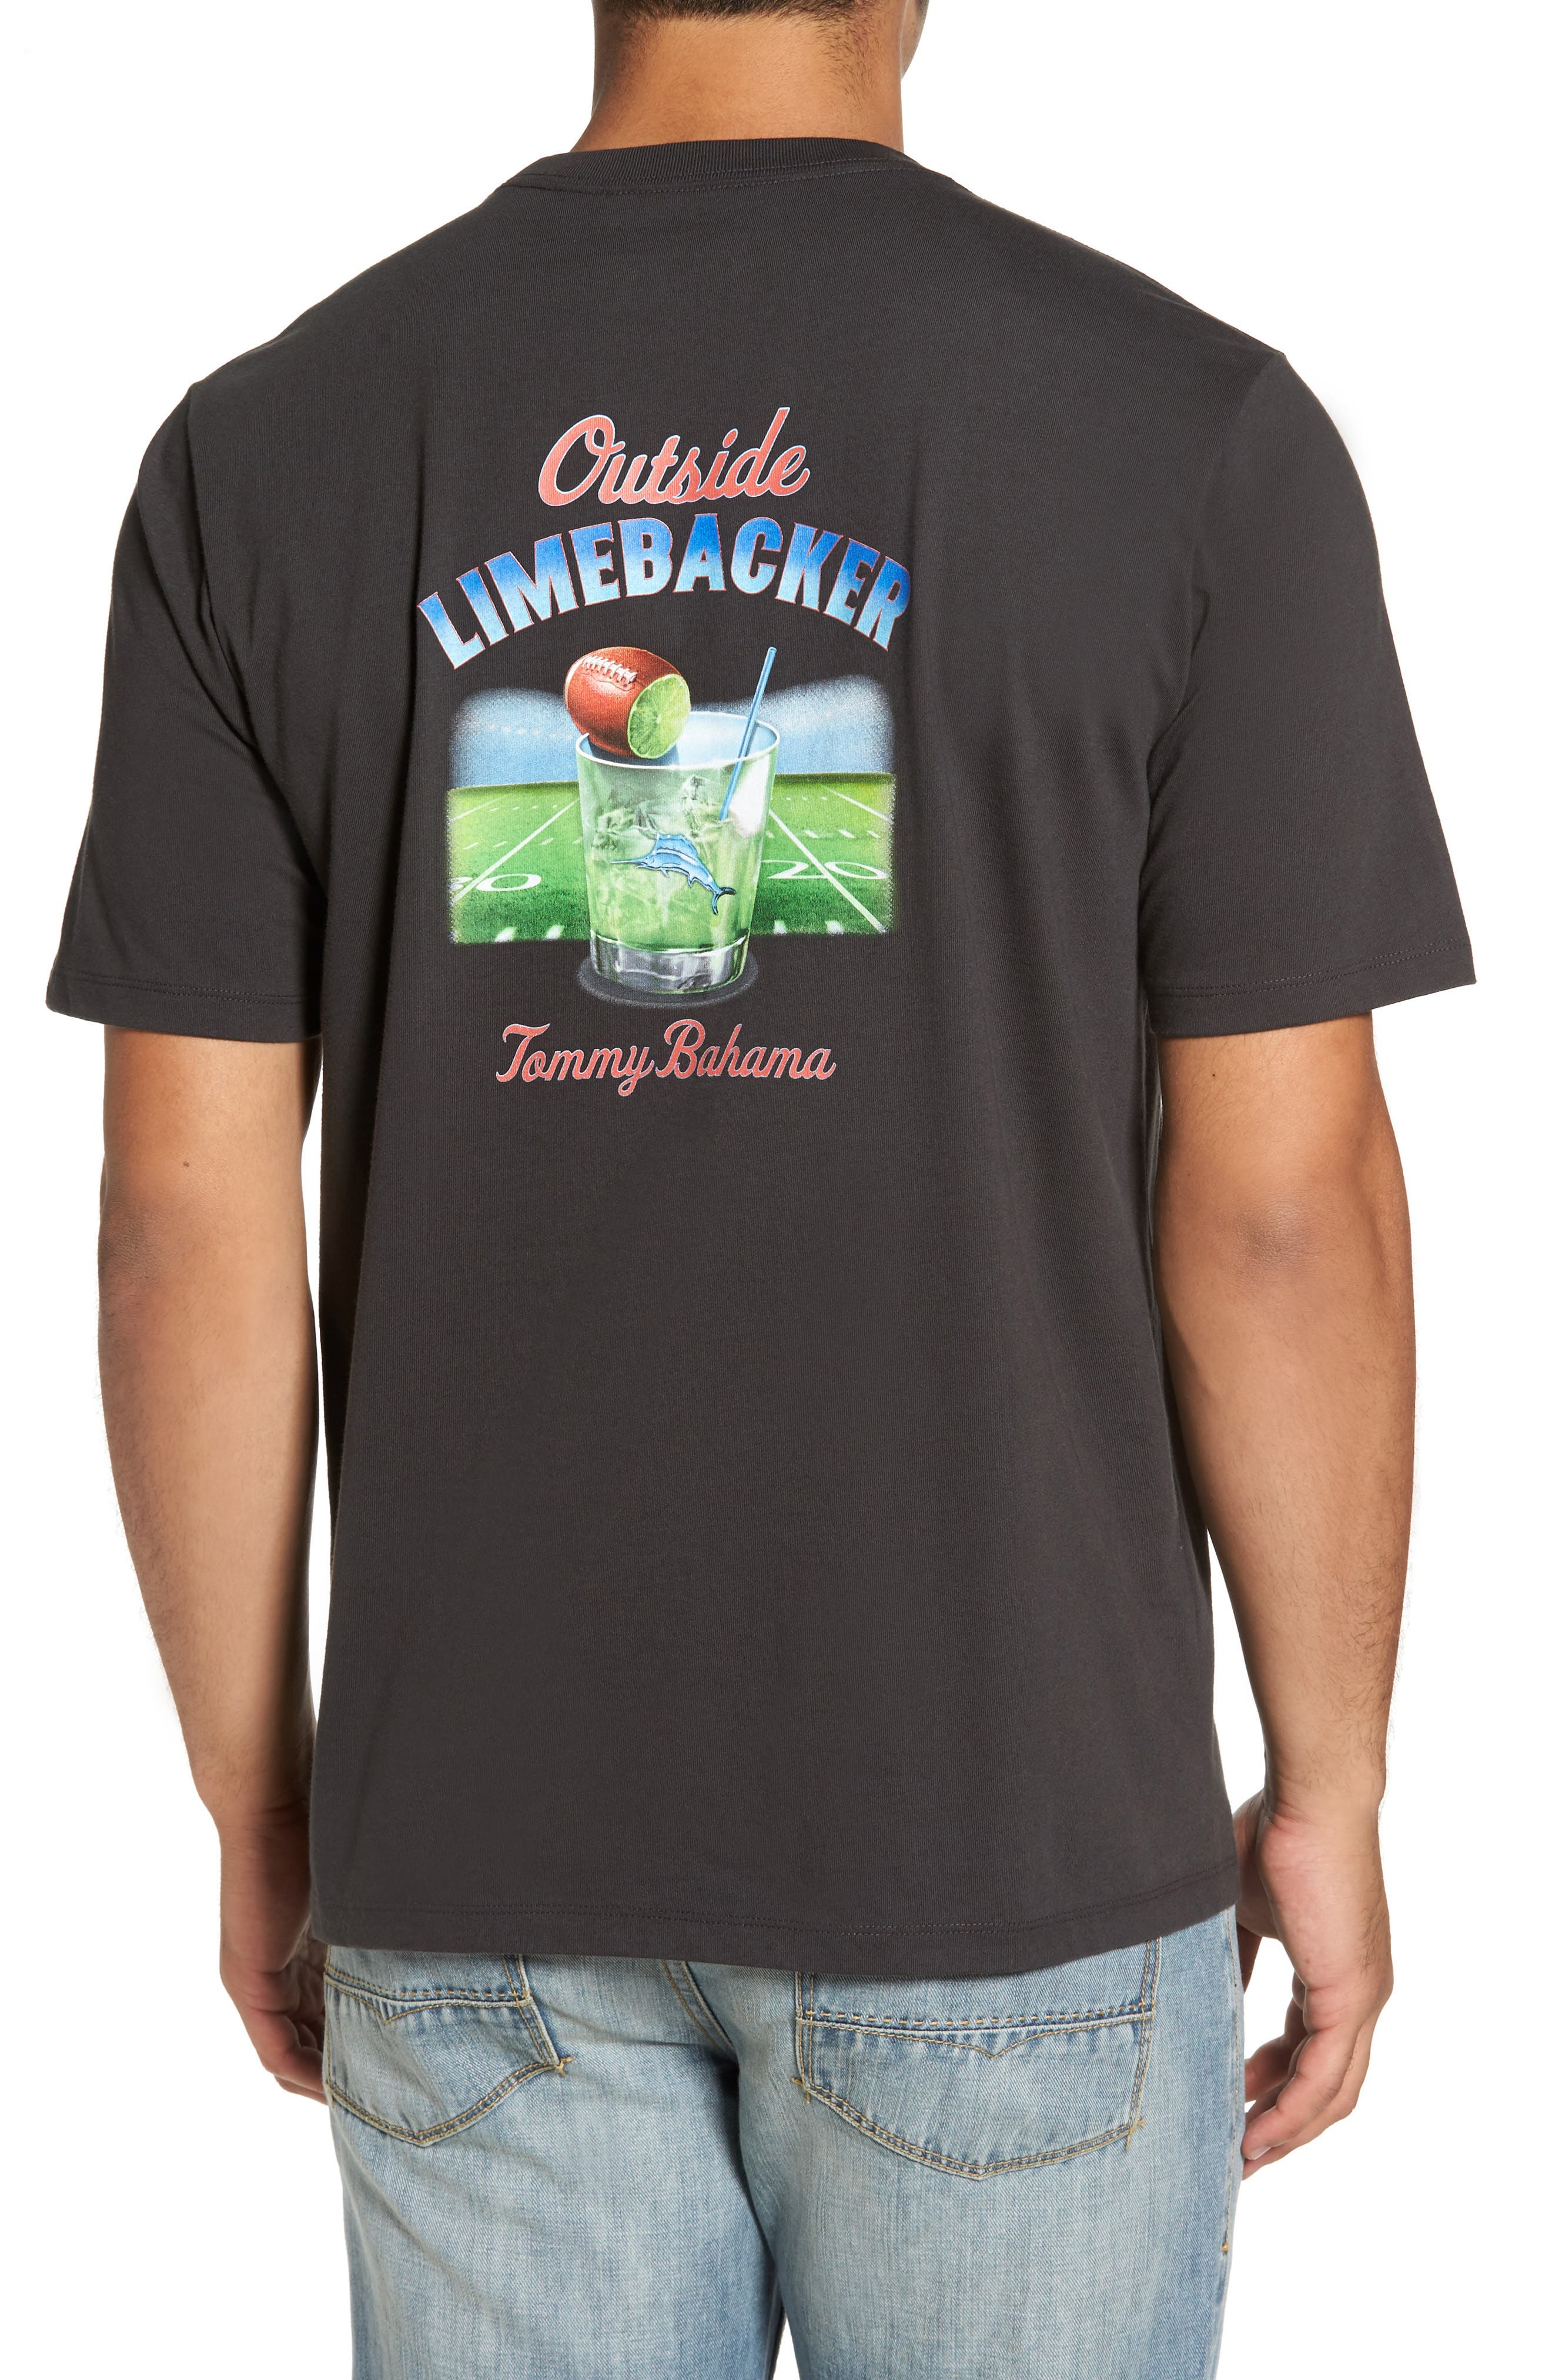 Alternate Image 2  - Tommy Bahama Outside Limebacker T-Shirt